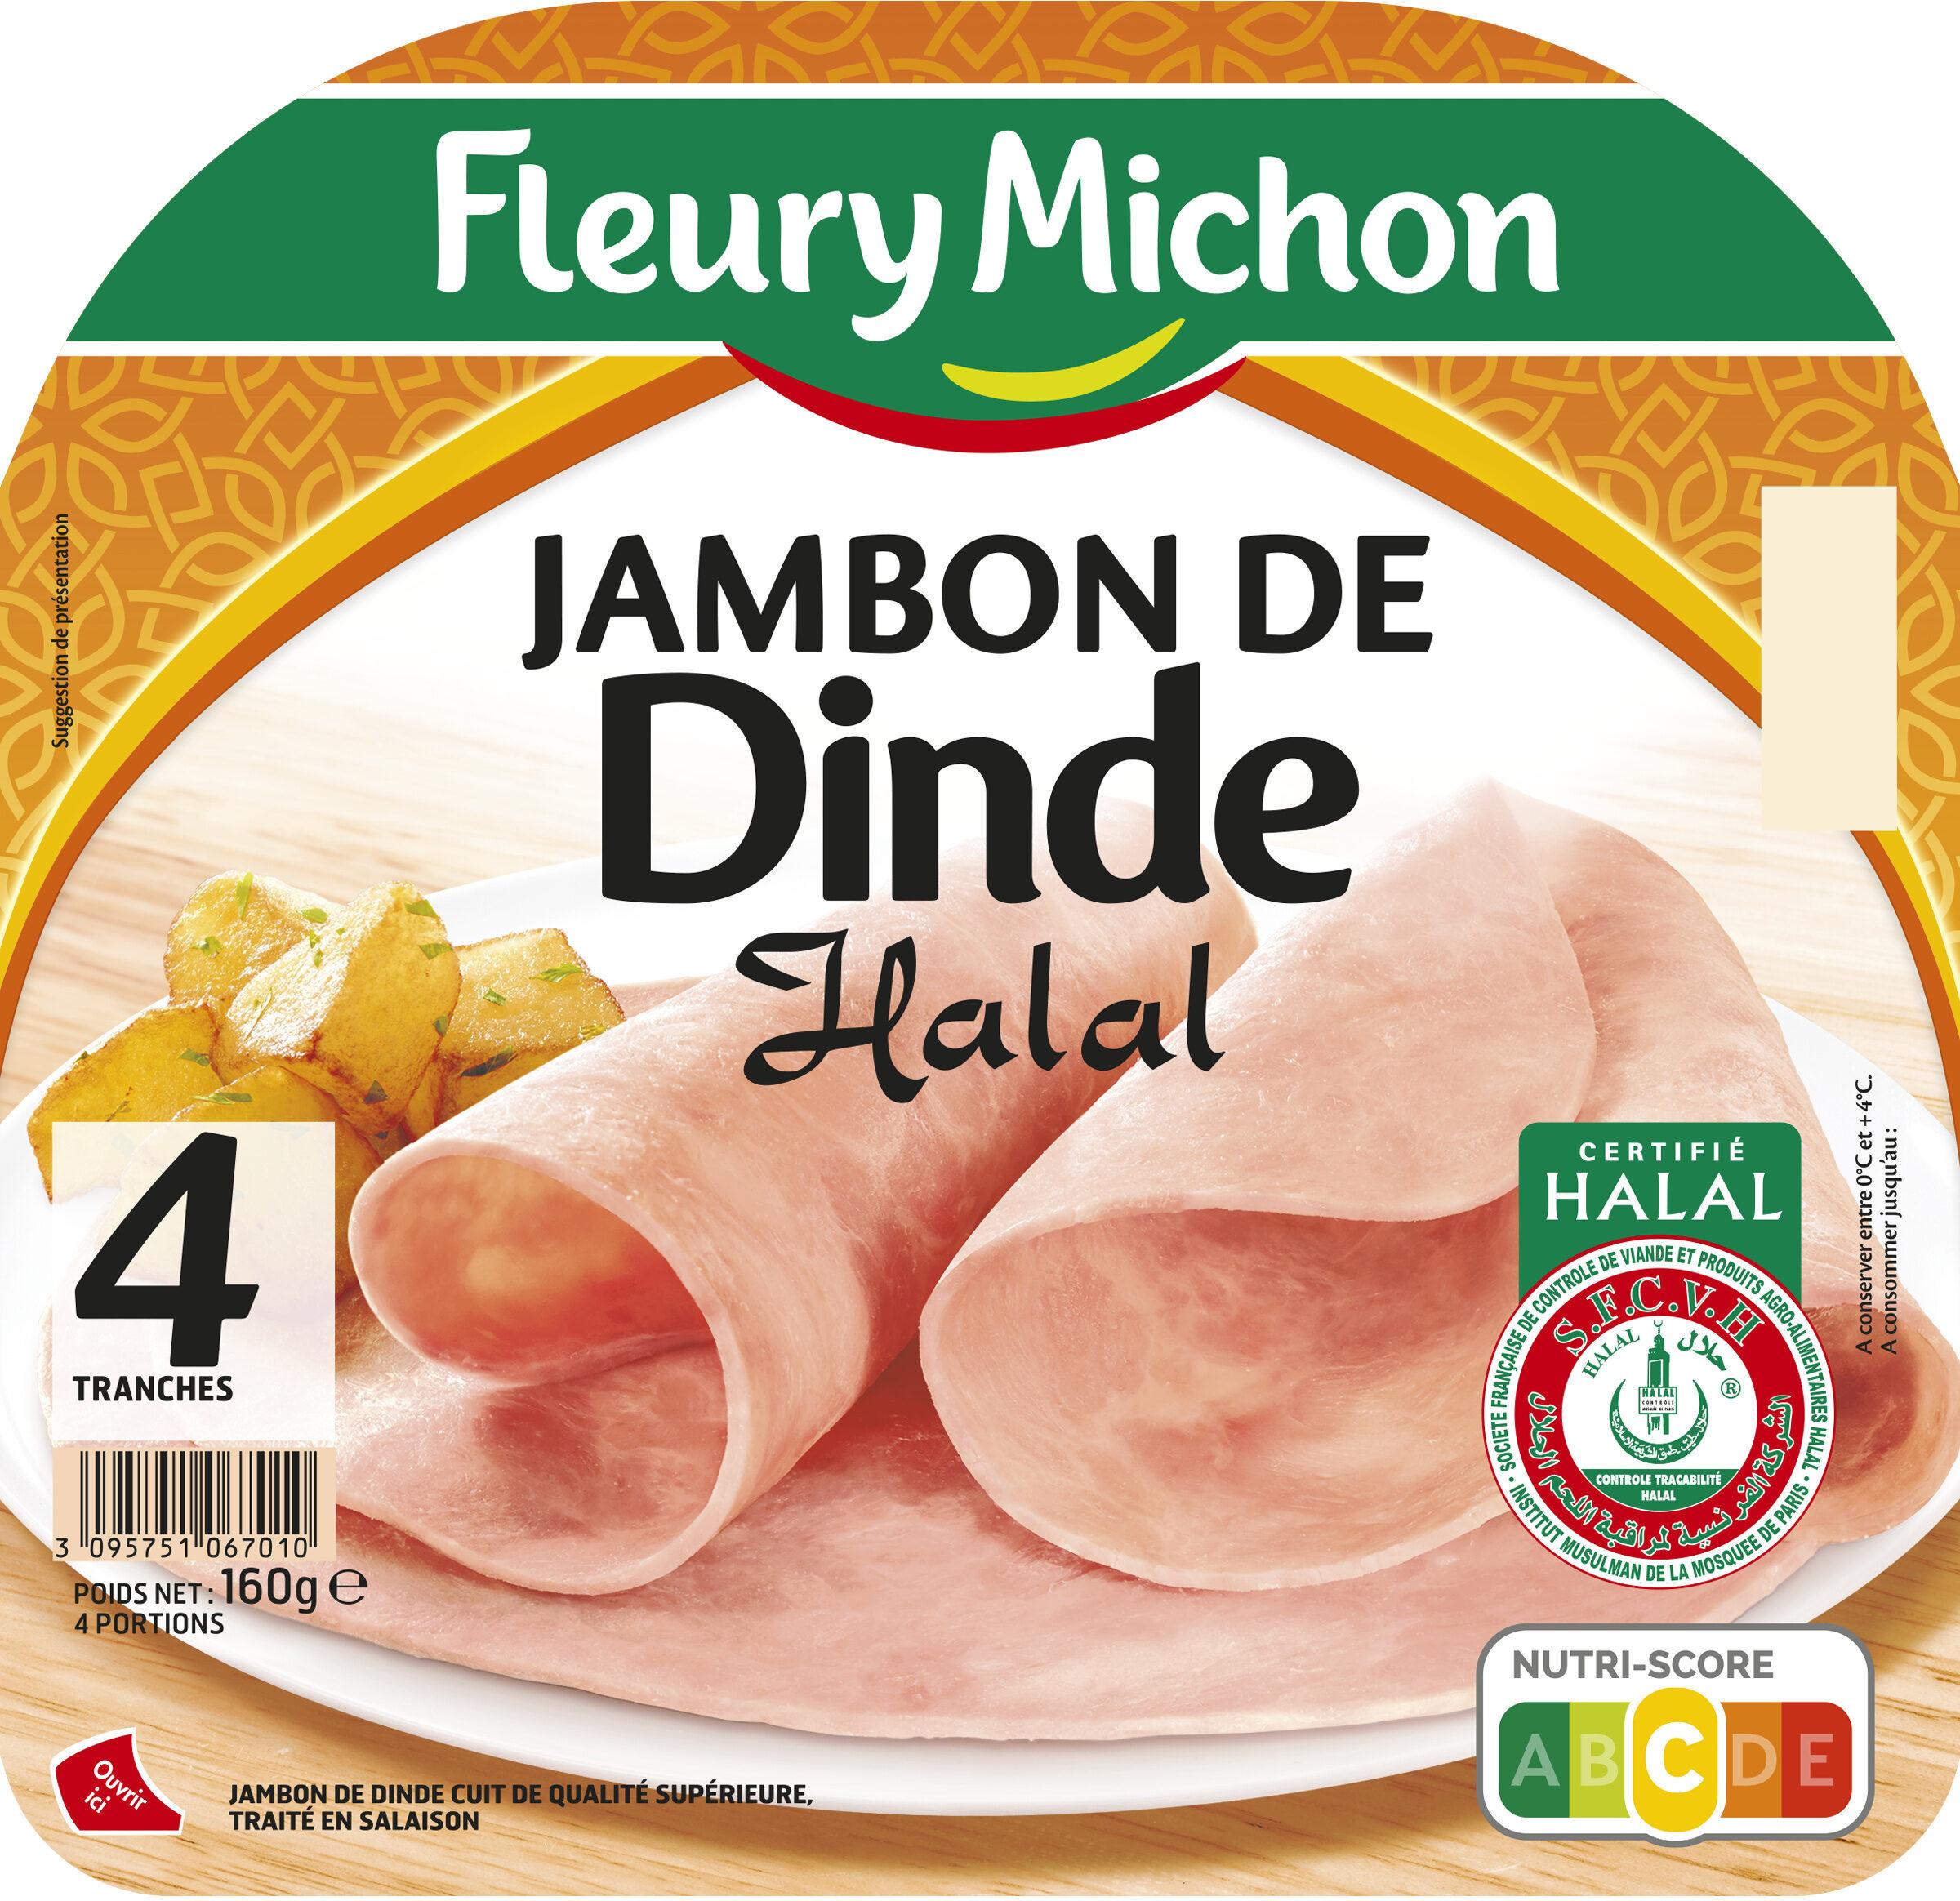 Jambon de dinde Halal - 4tr. - Product - fr